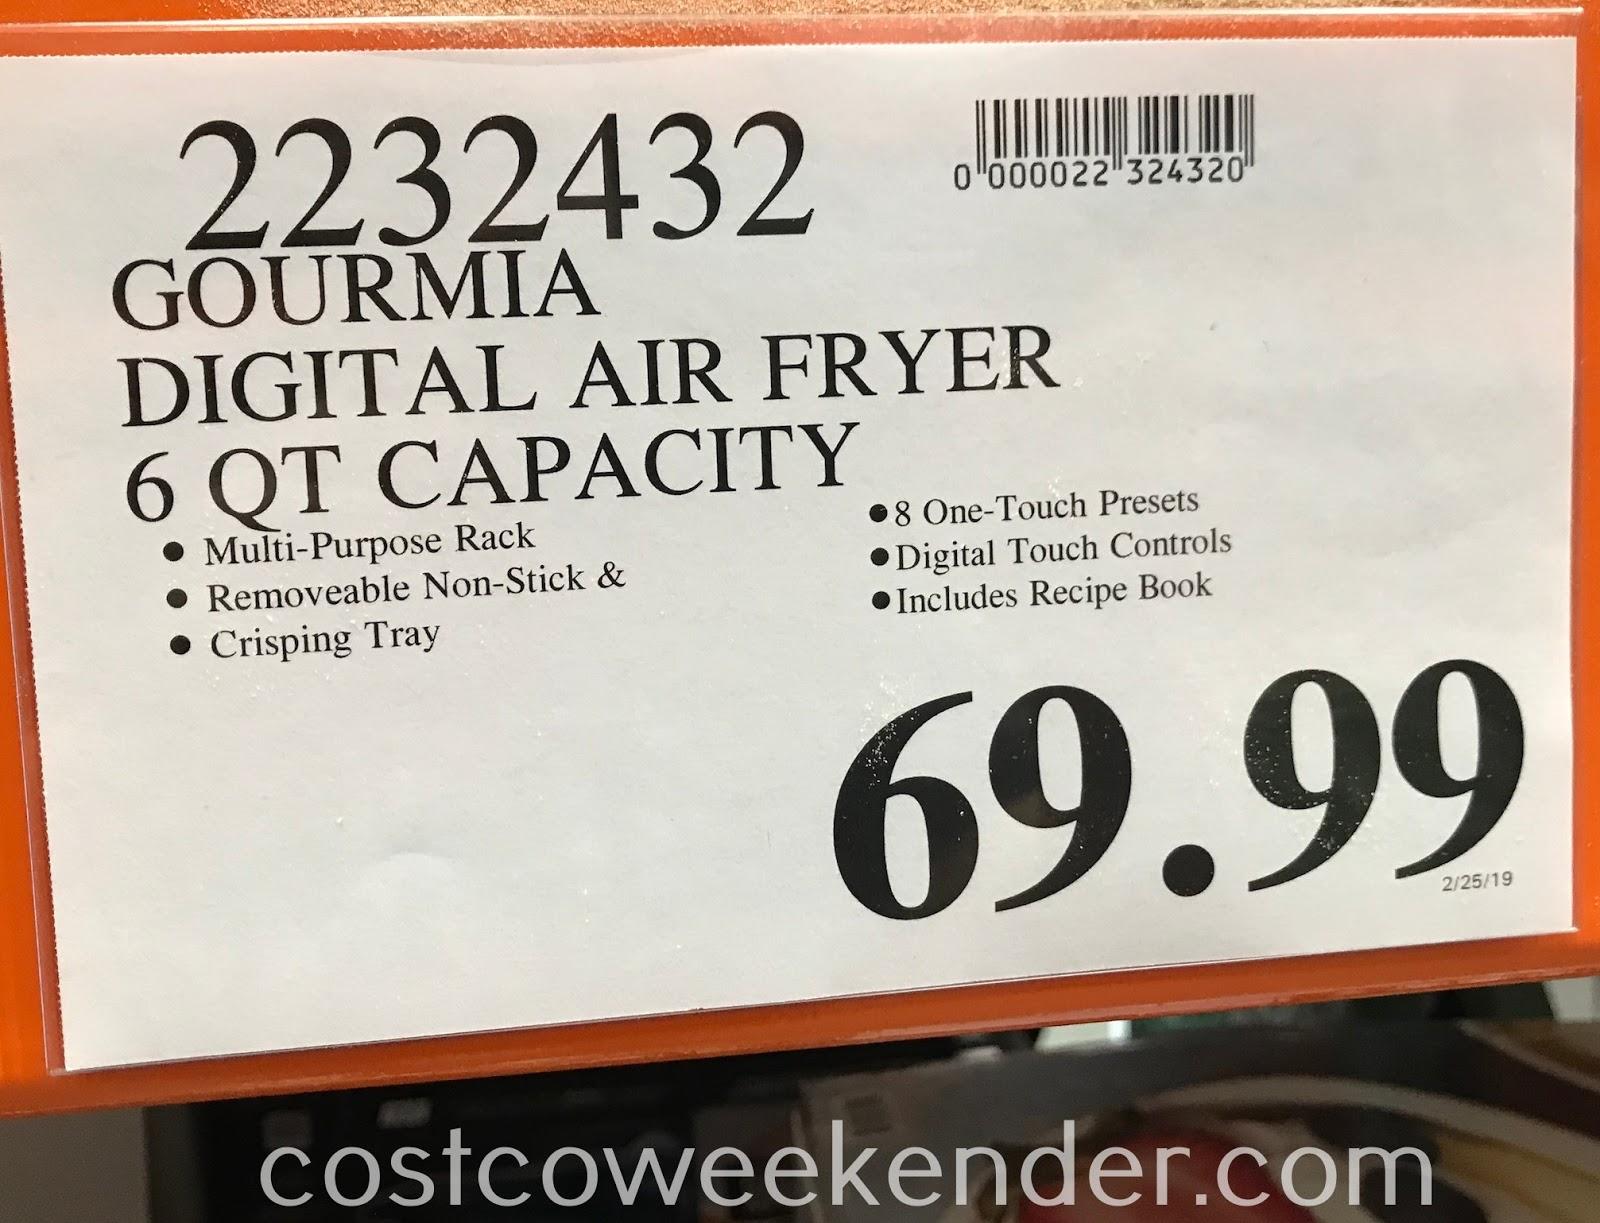 Deal for the Gourmia 6qt Digital Air Fryer at Costco